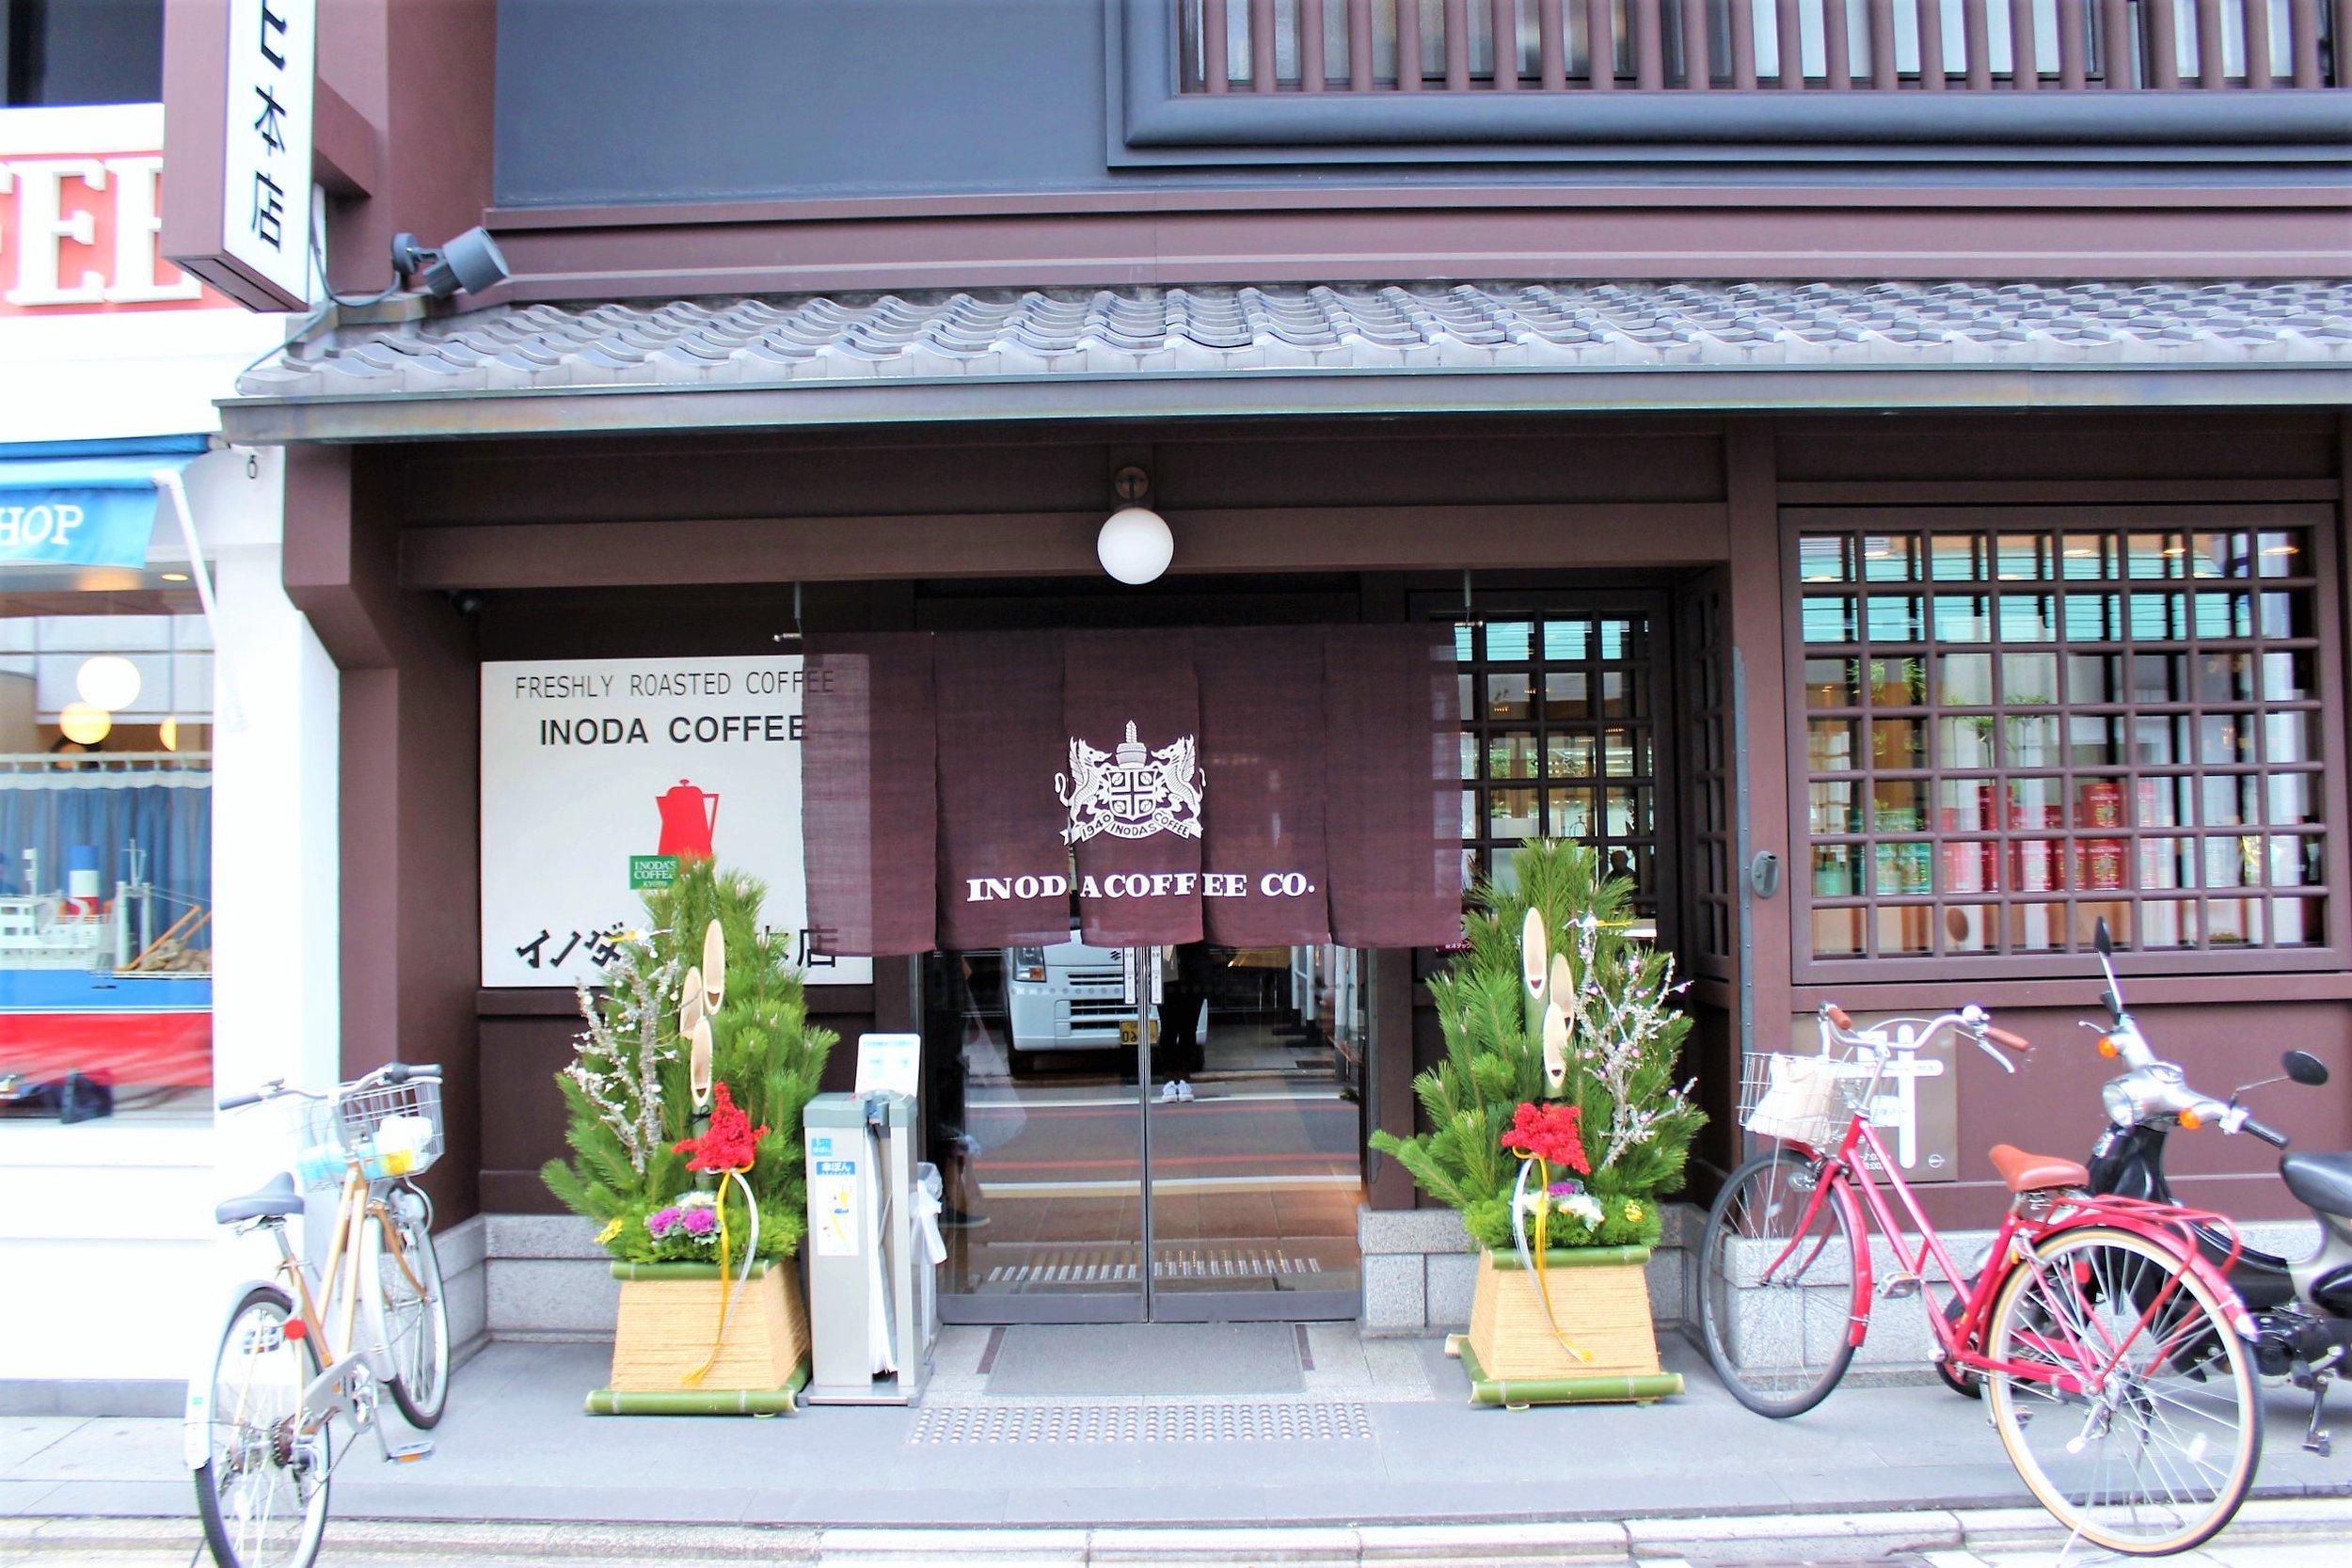 Inoda Coffee in Kyoto, Japan